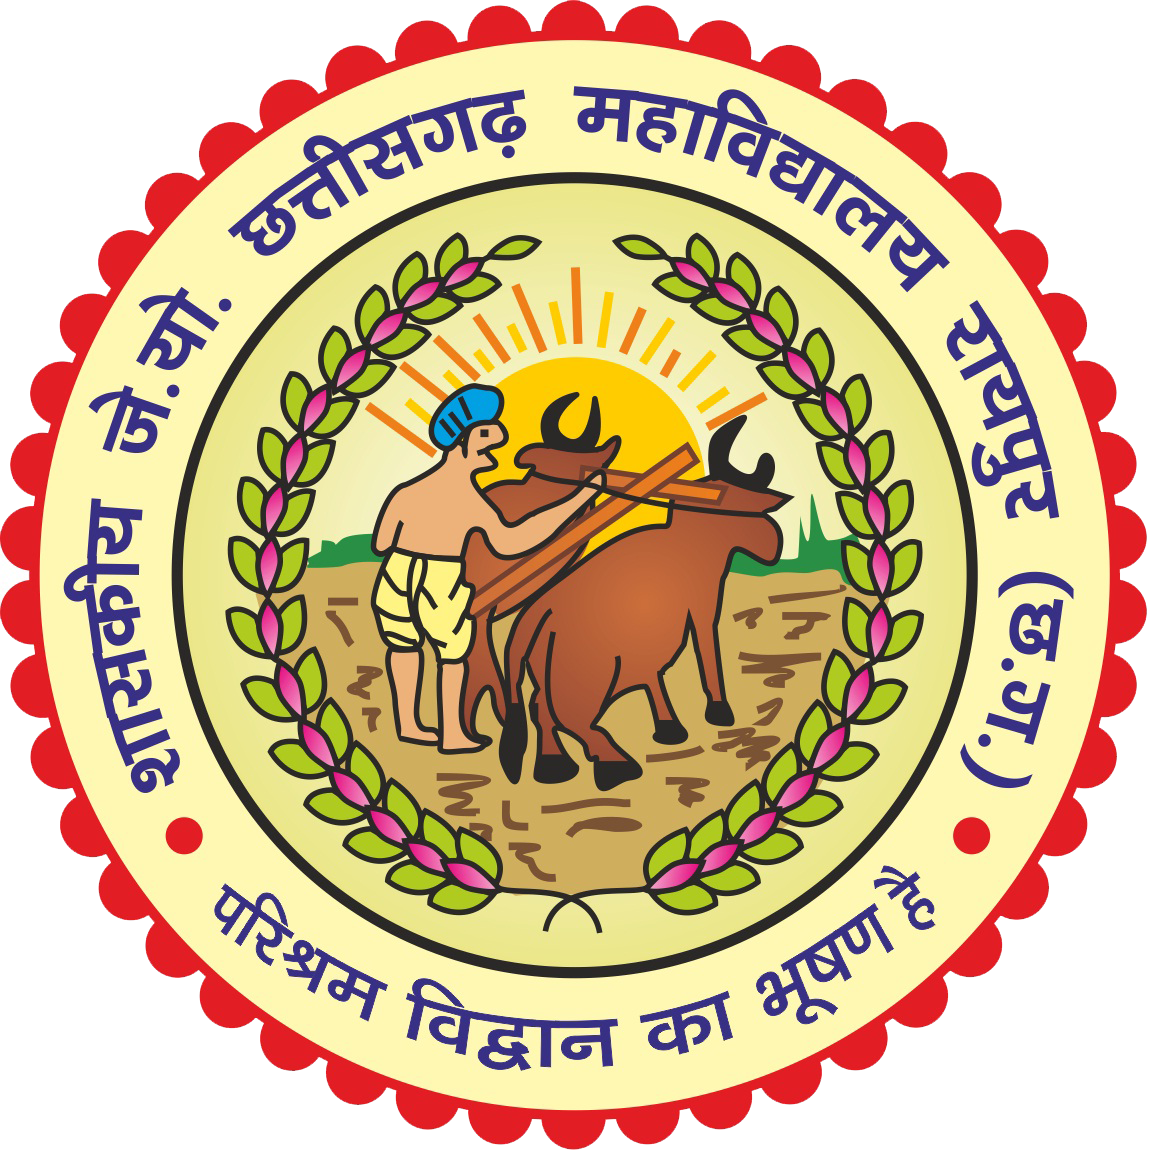 j yoganandam chhattisgarh college raipur address